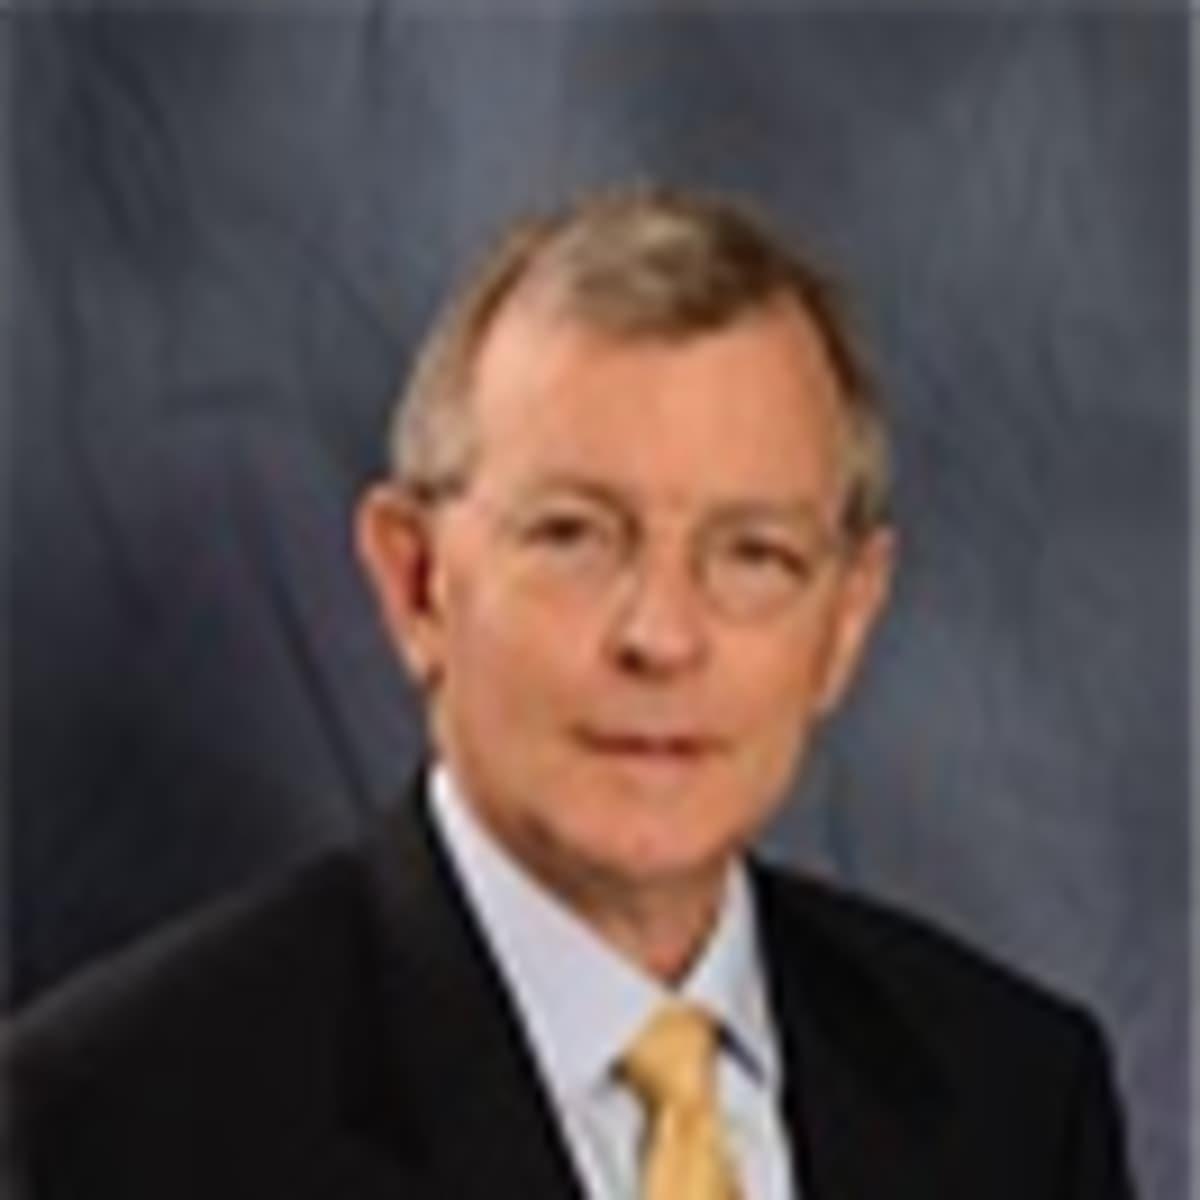 Dr Luckie Saraland Al: Dr. John Dixon, MD